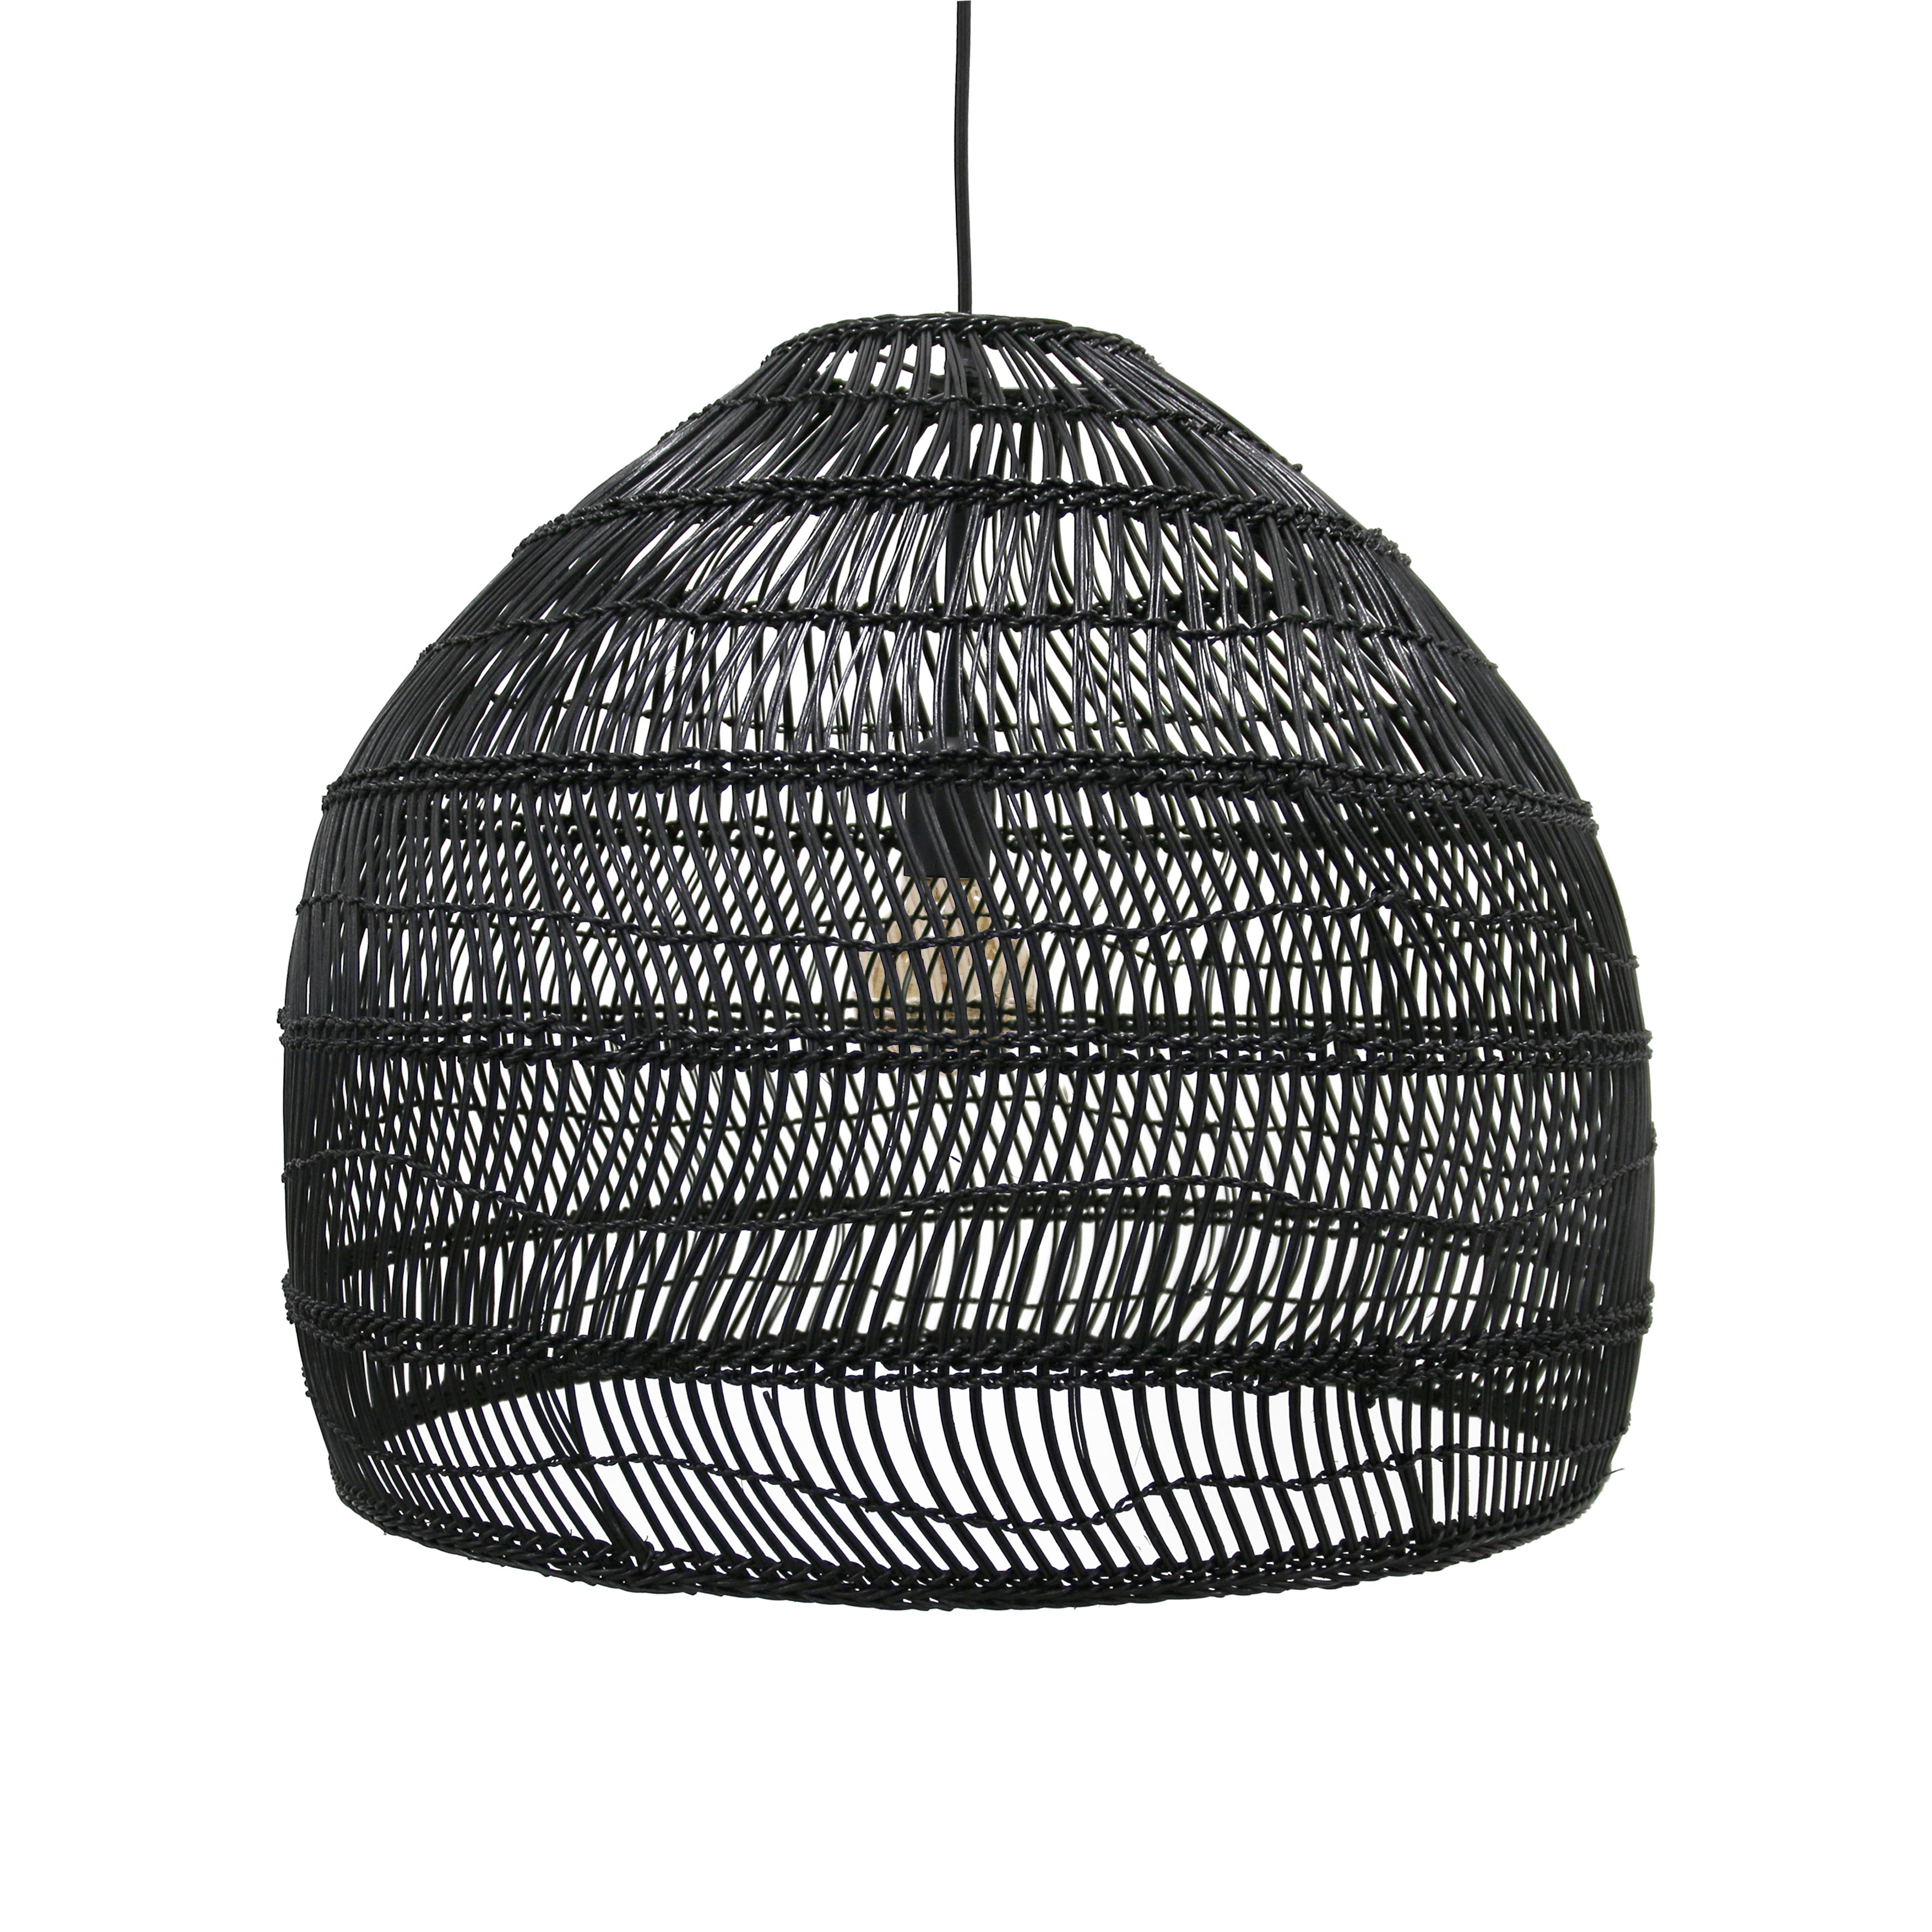 Woven Wicker Ceiling Pendant Light